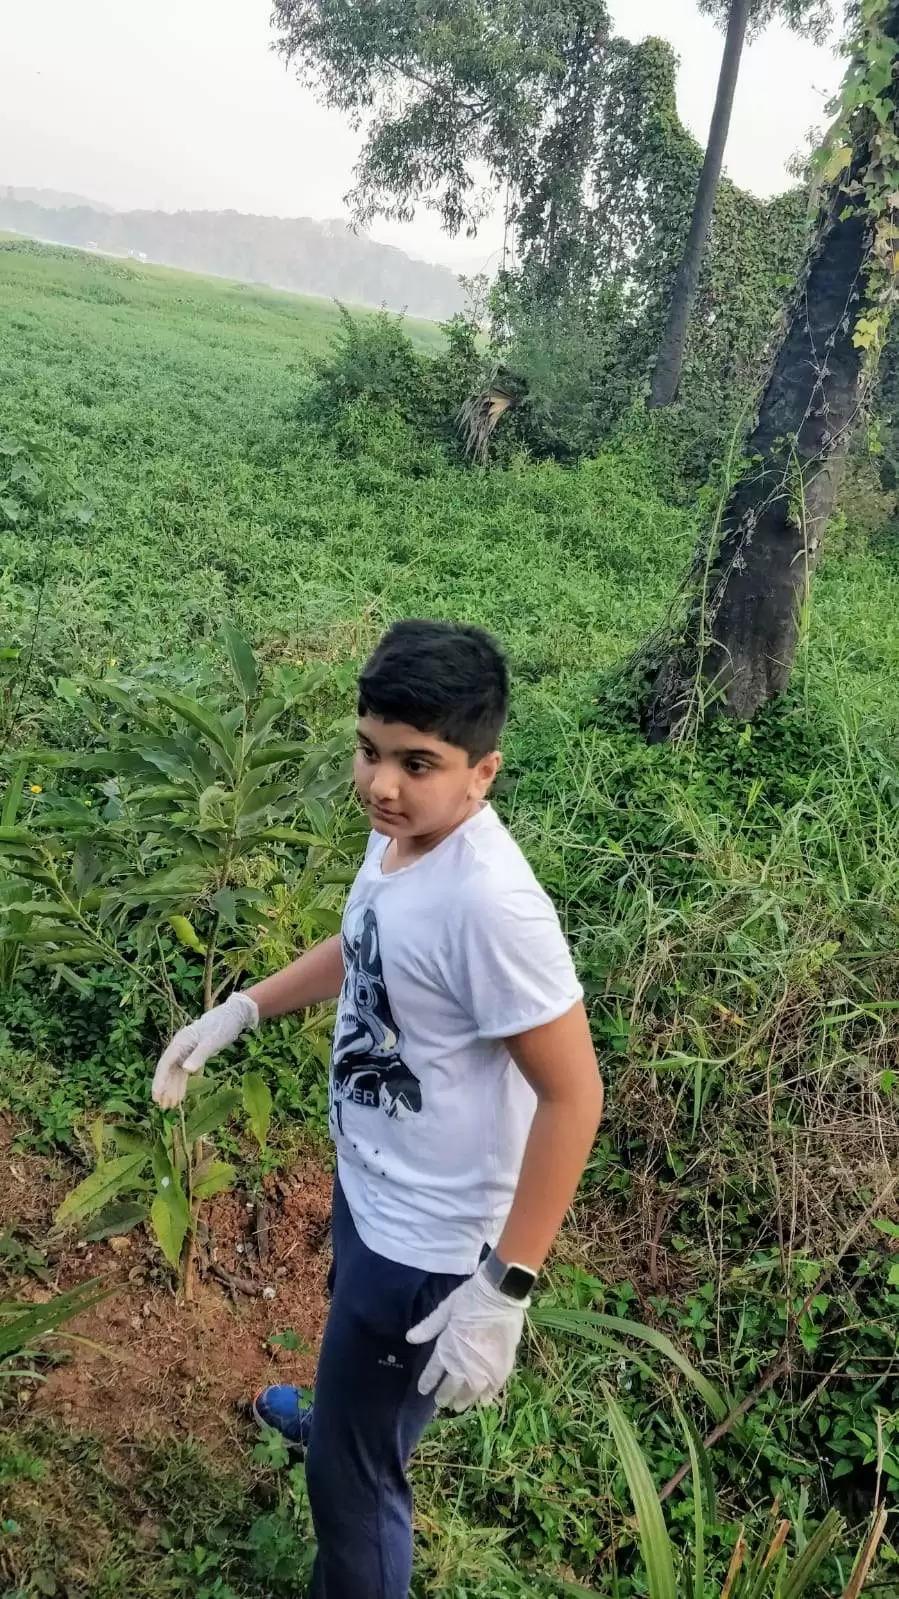 Candid conversation with 12-year-old environmentalist Ayaan Shankta